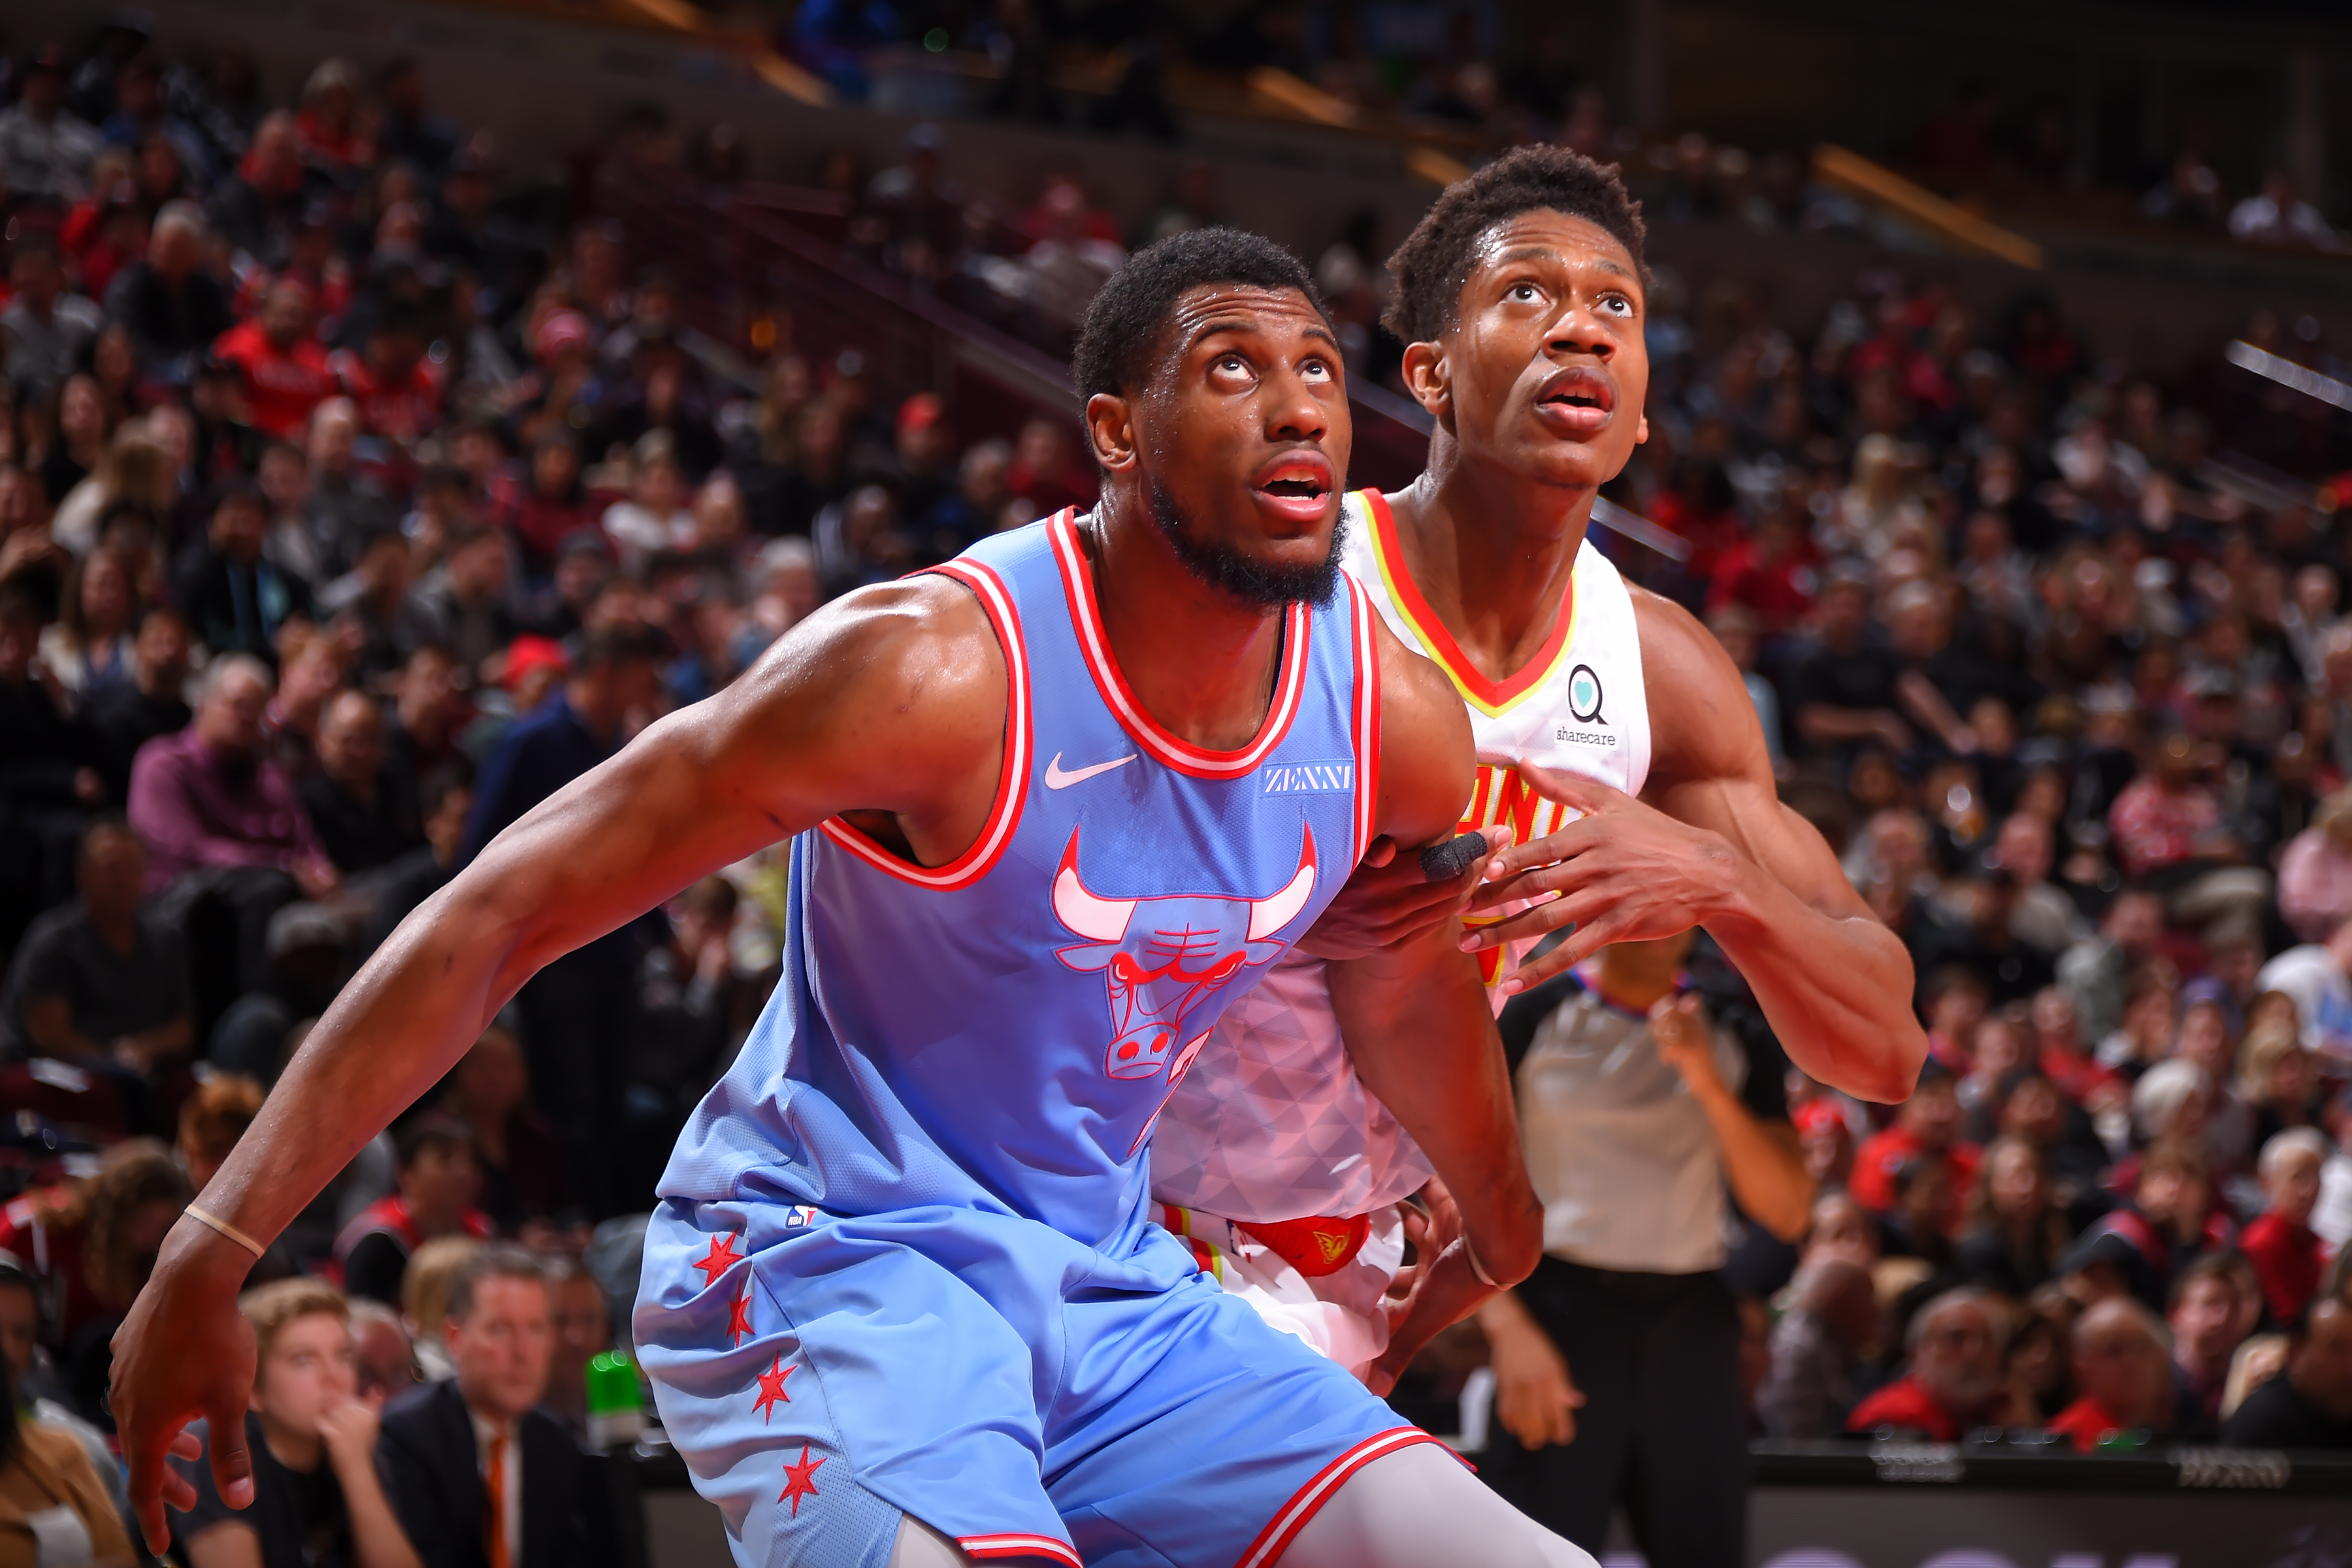 2020 Fantasy Basketball Values Top Four Nba Picks Under 4k